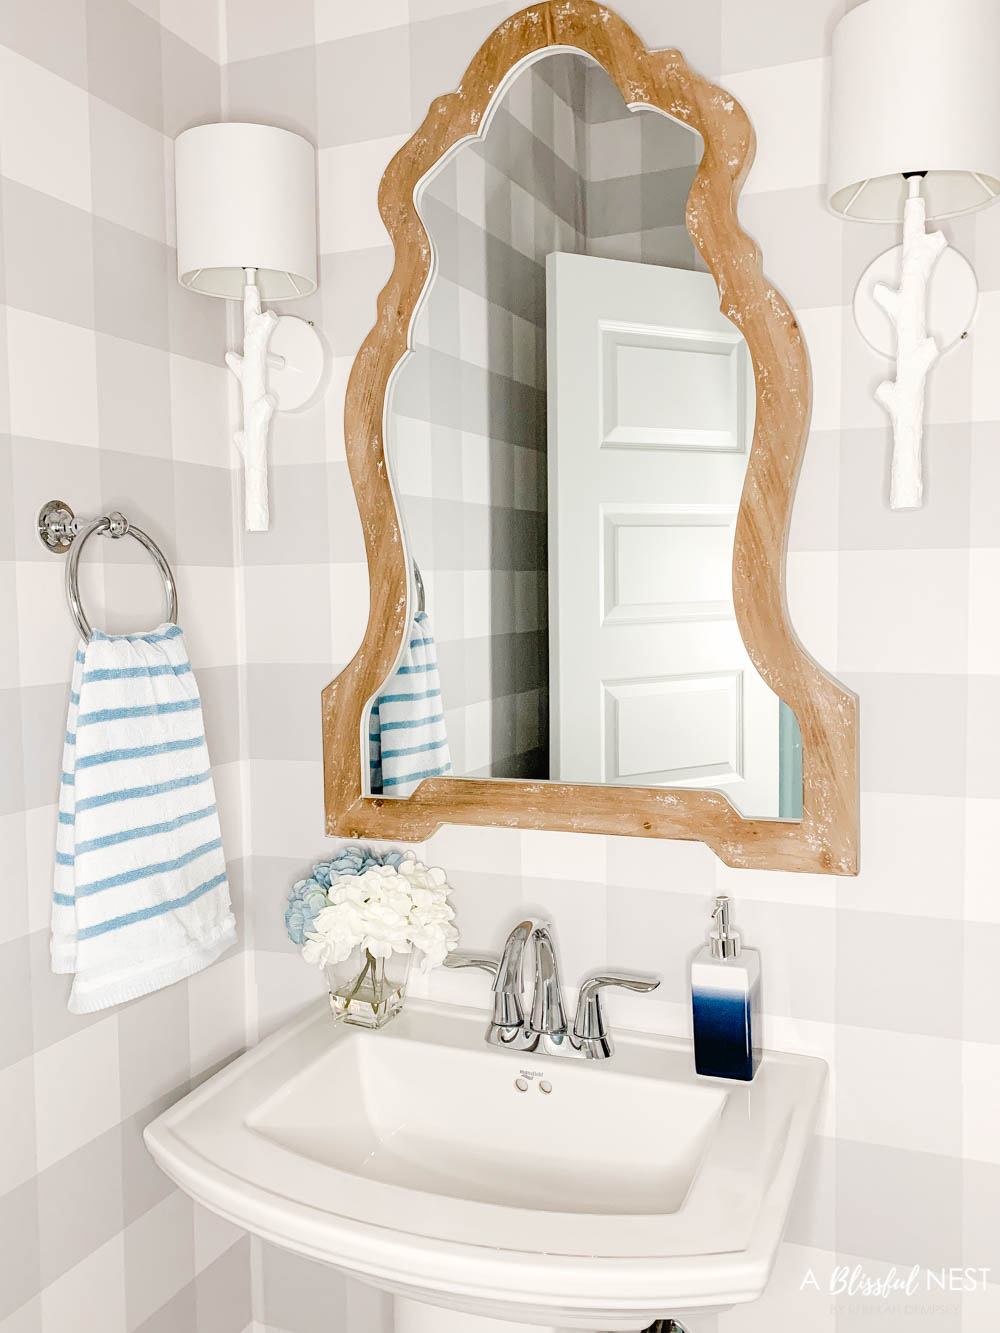 Soft blue decor accents, bathroom accessory updates, fresh candle, buffalo check wallpaper. #ABlissfulNest #WalmartHome #bathroomdesign